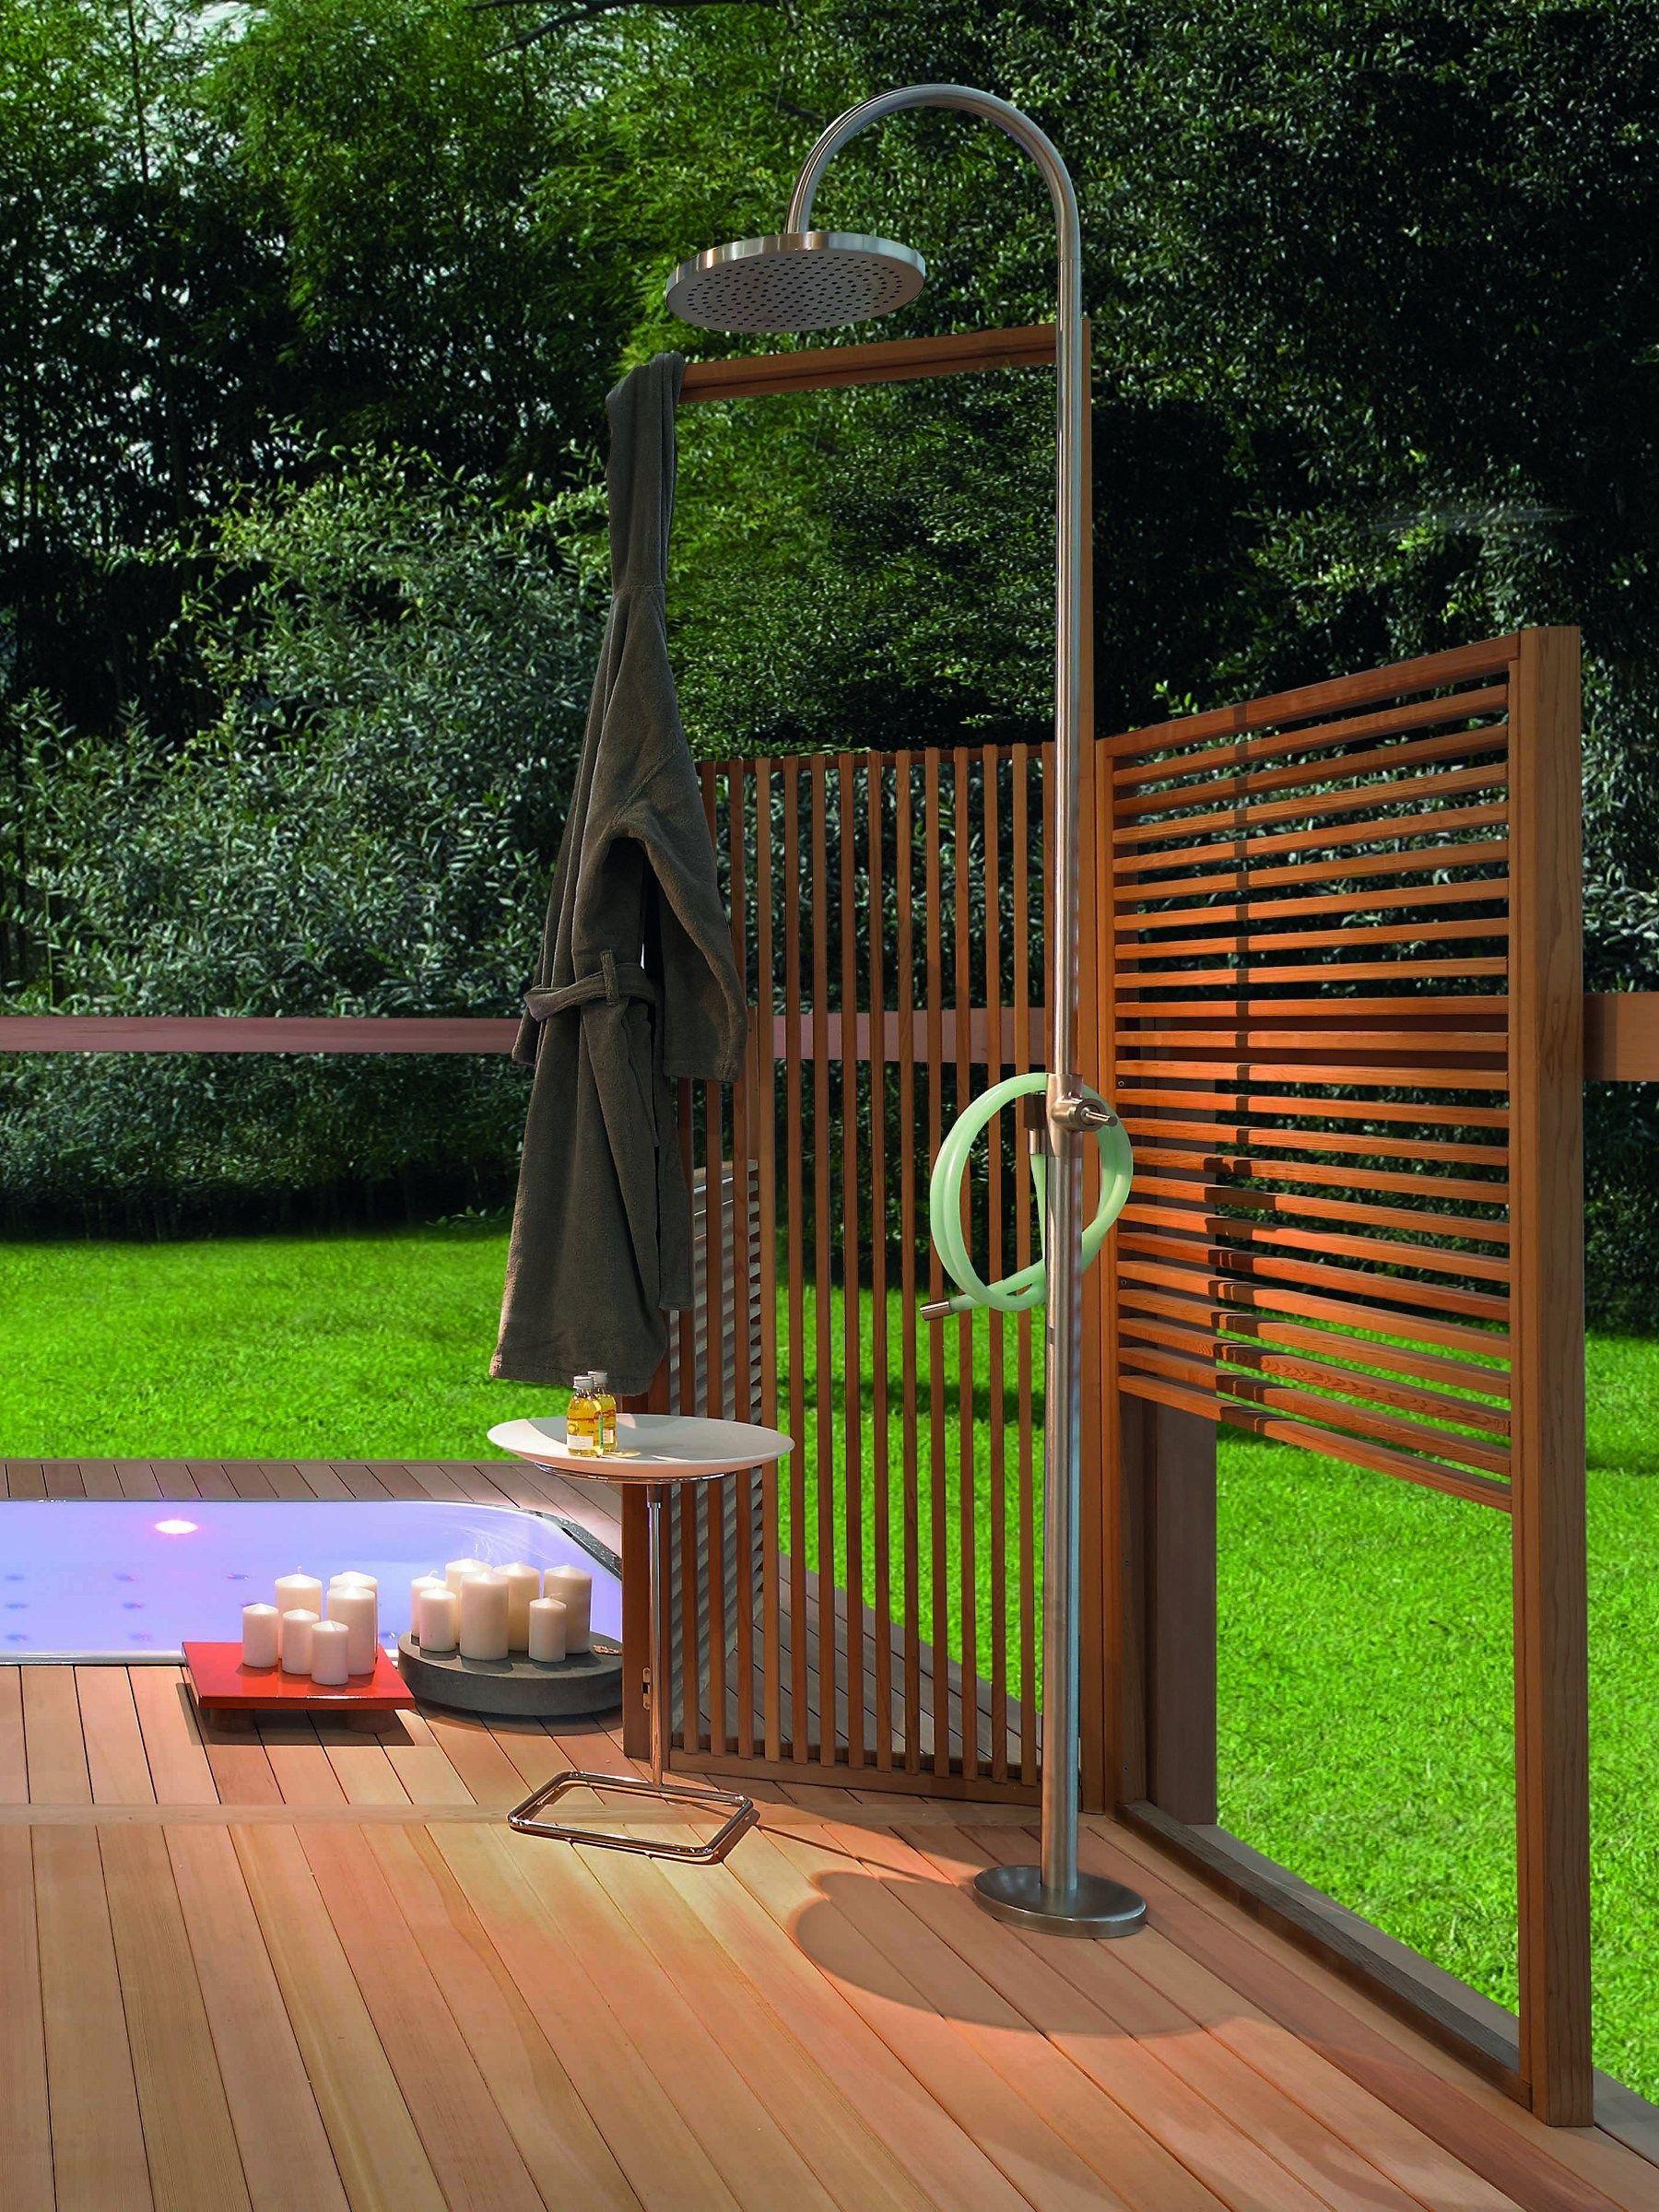 stainless steel outdoor shower shower columns by kos by zucchetti